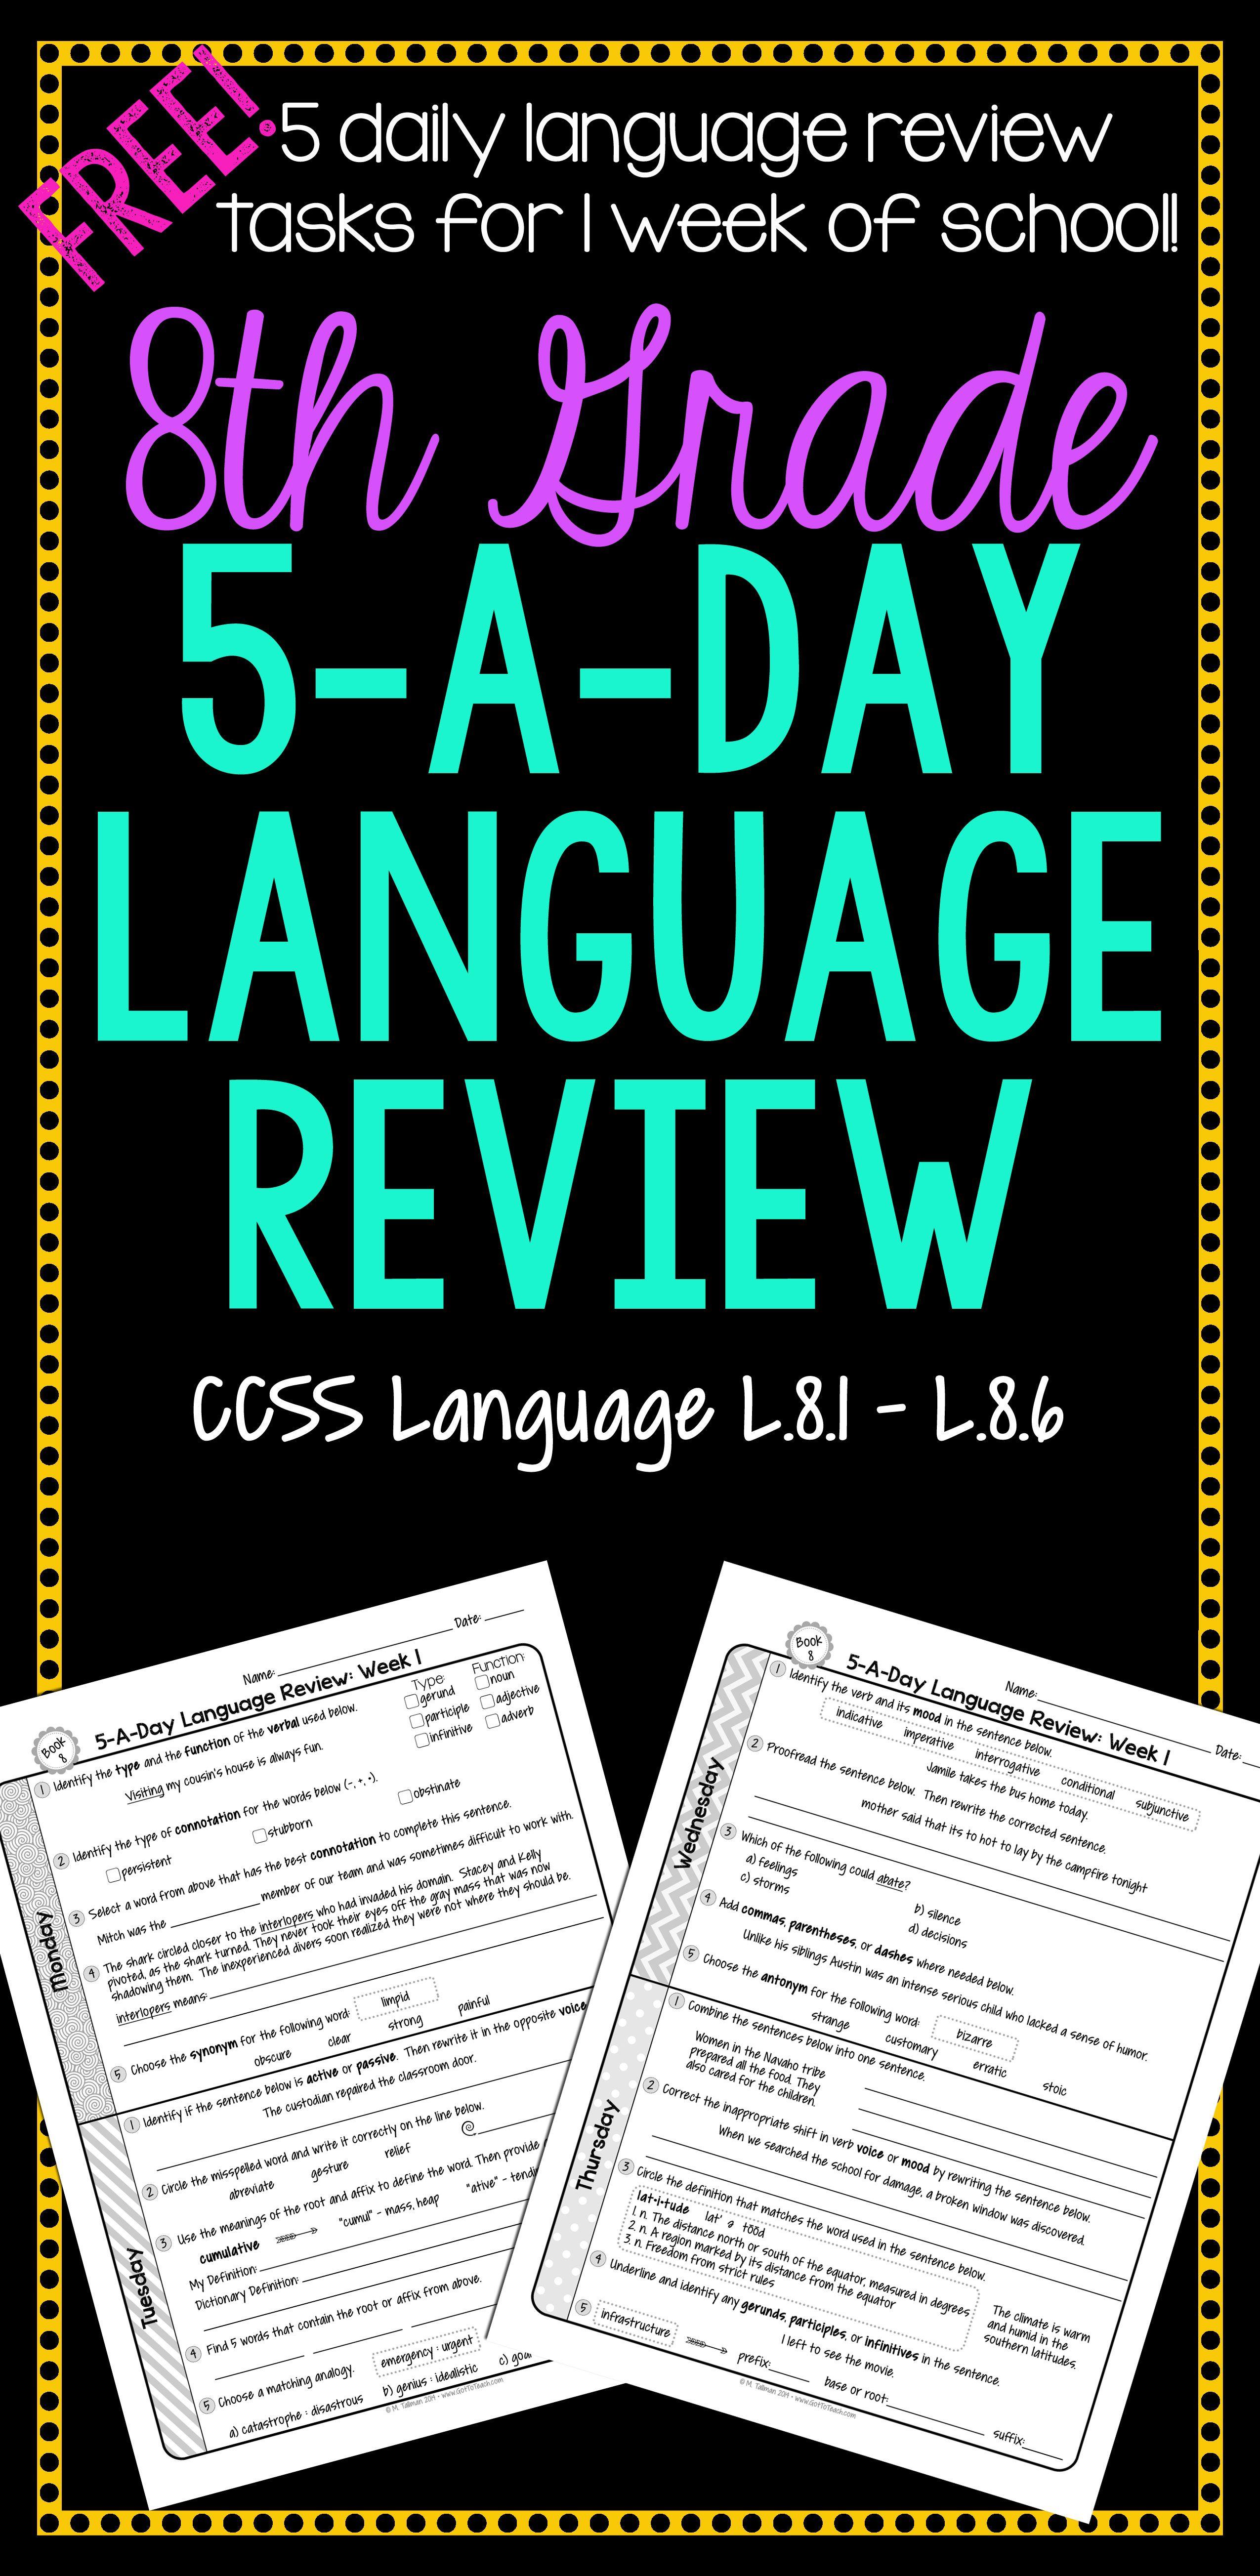 8th Grade Daily Language Spiral Review - 1 Week FREE   Daily language  review [ 5214 x 2550 Pixel ]